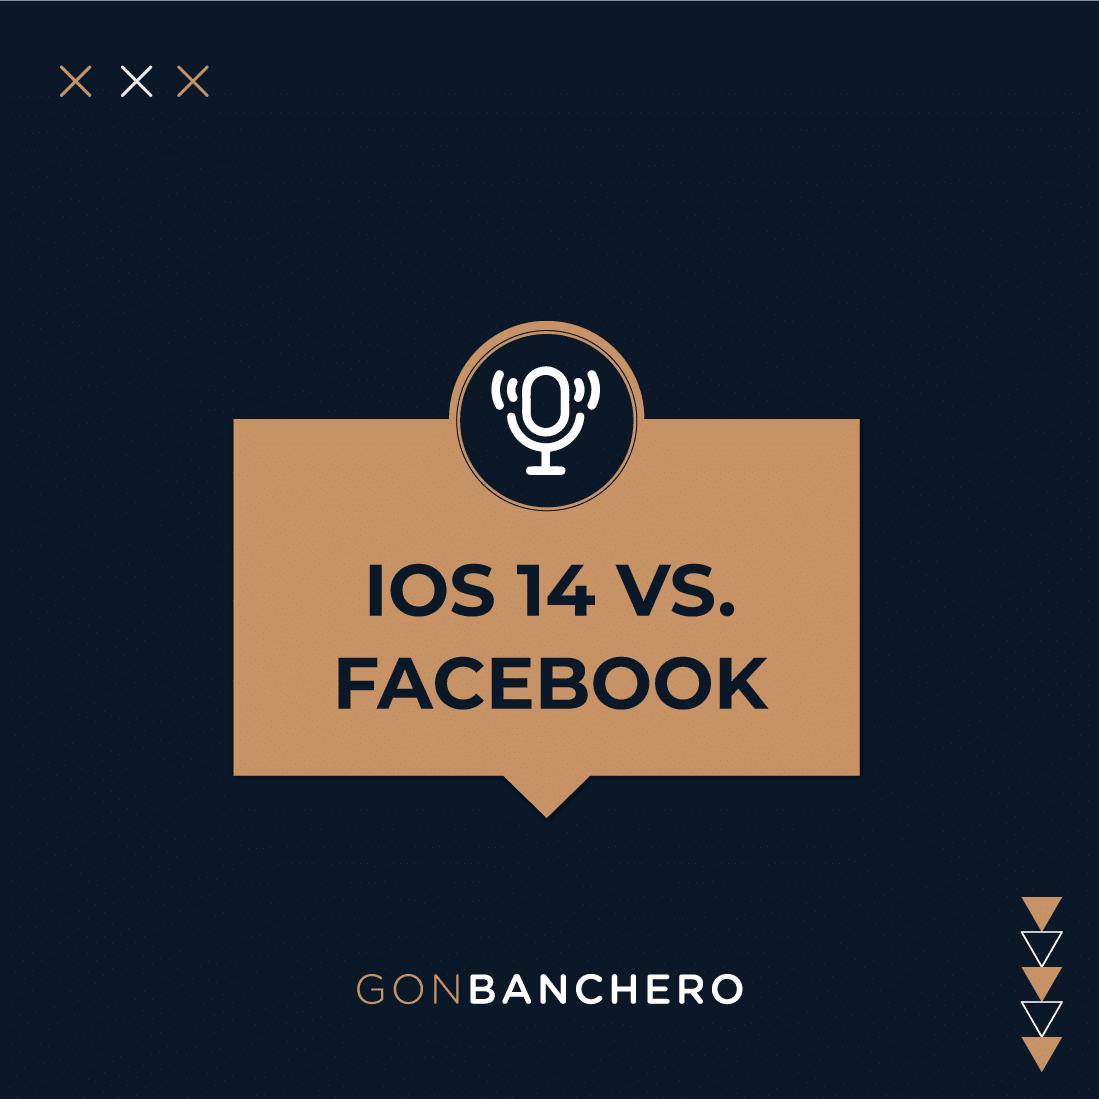 ios-vs-facebook